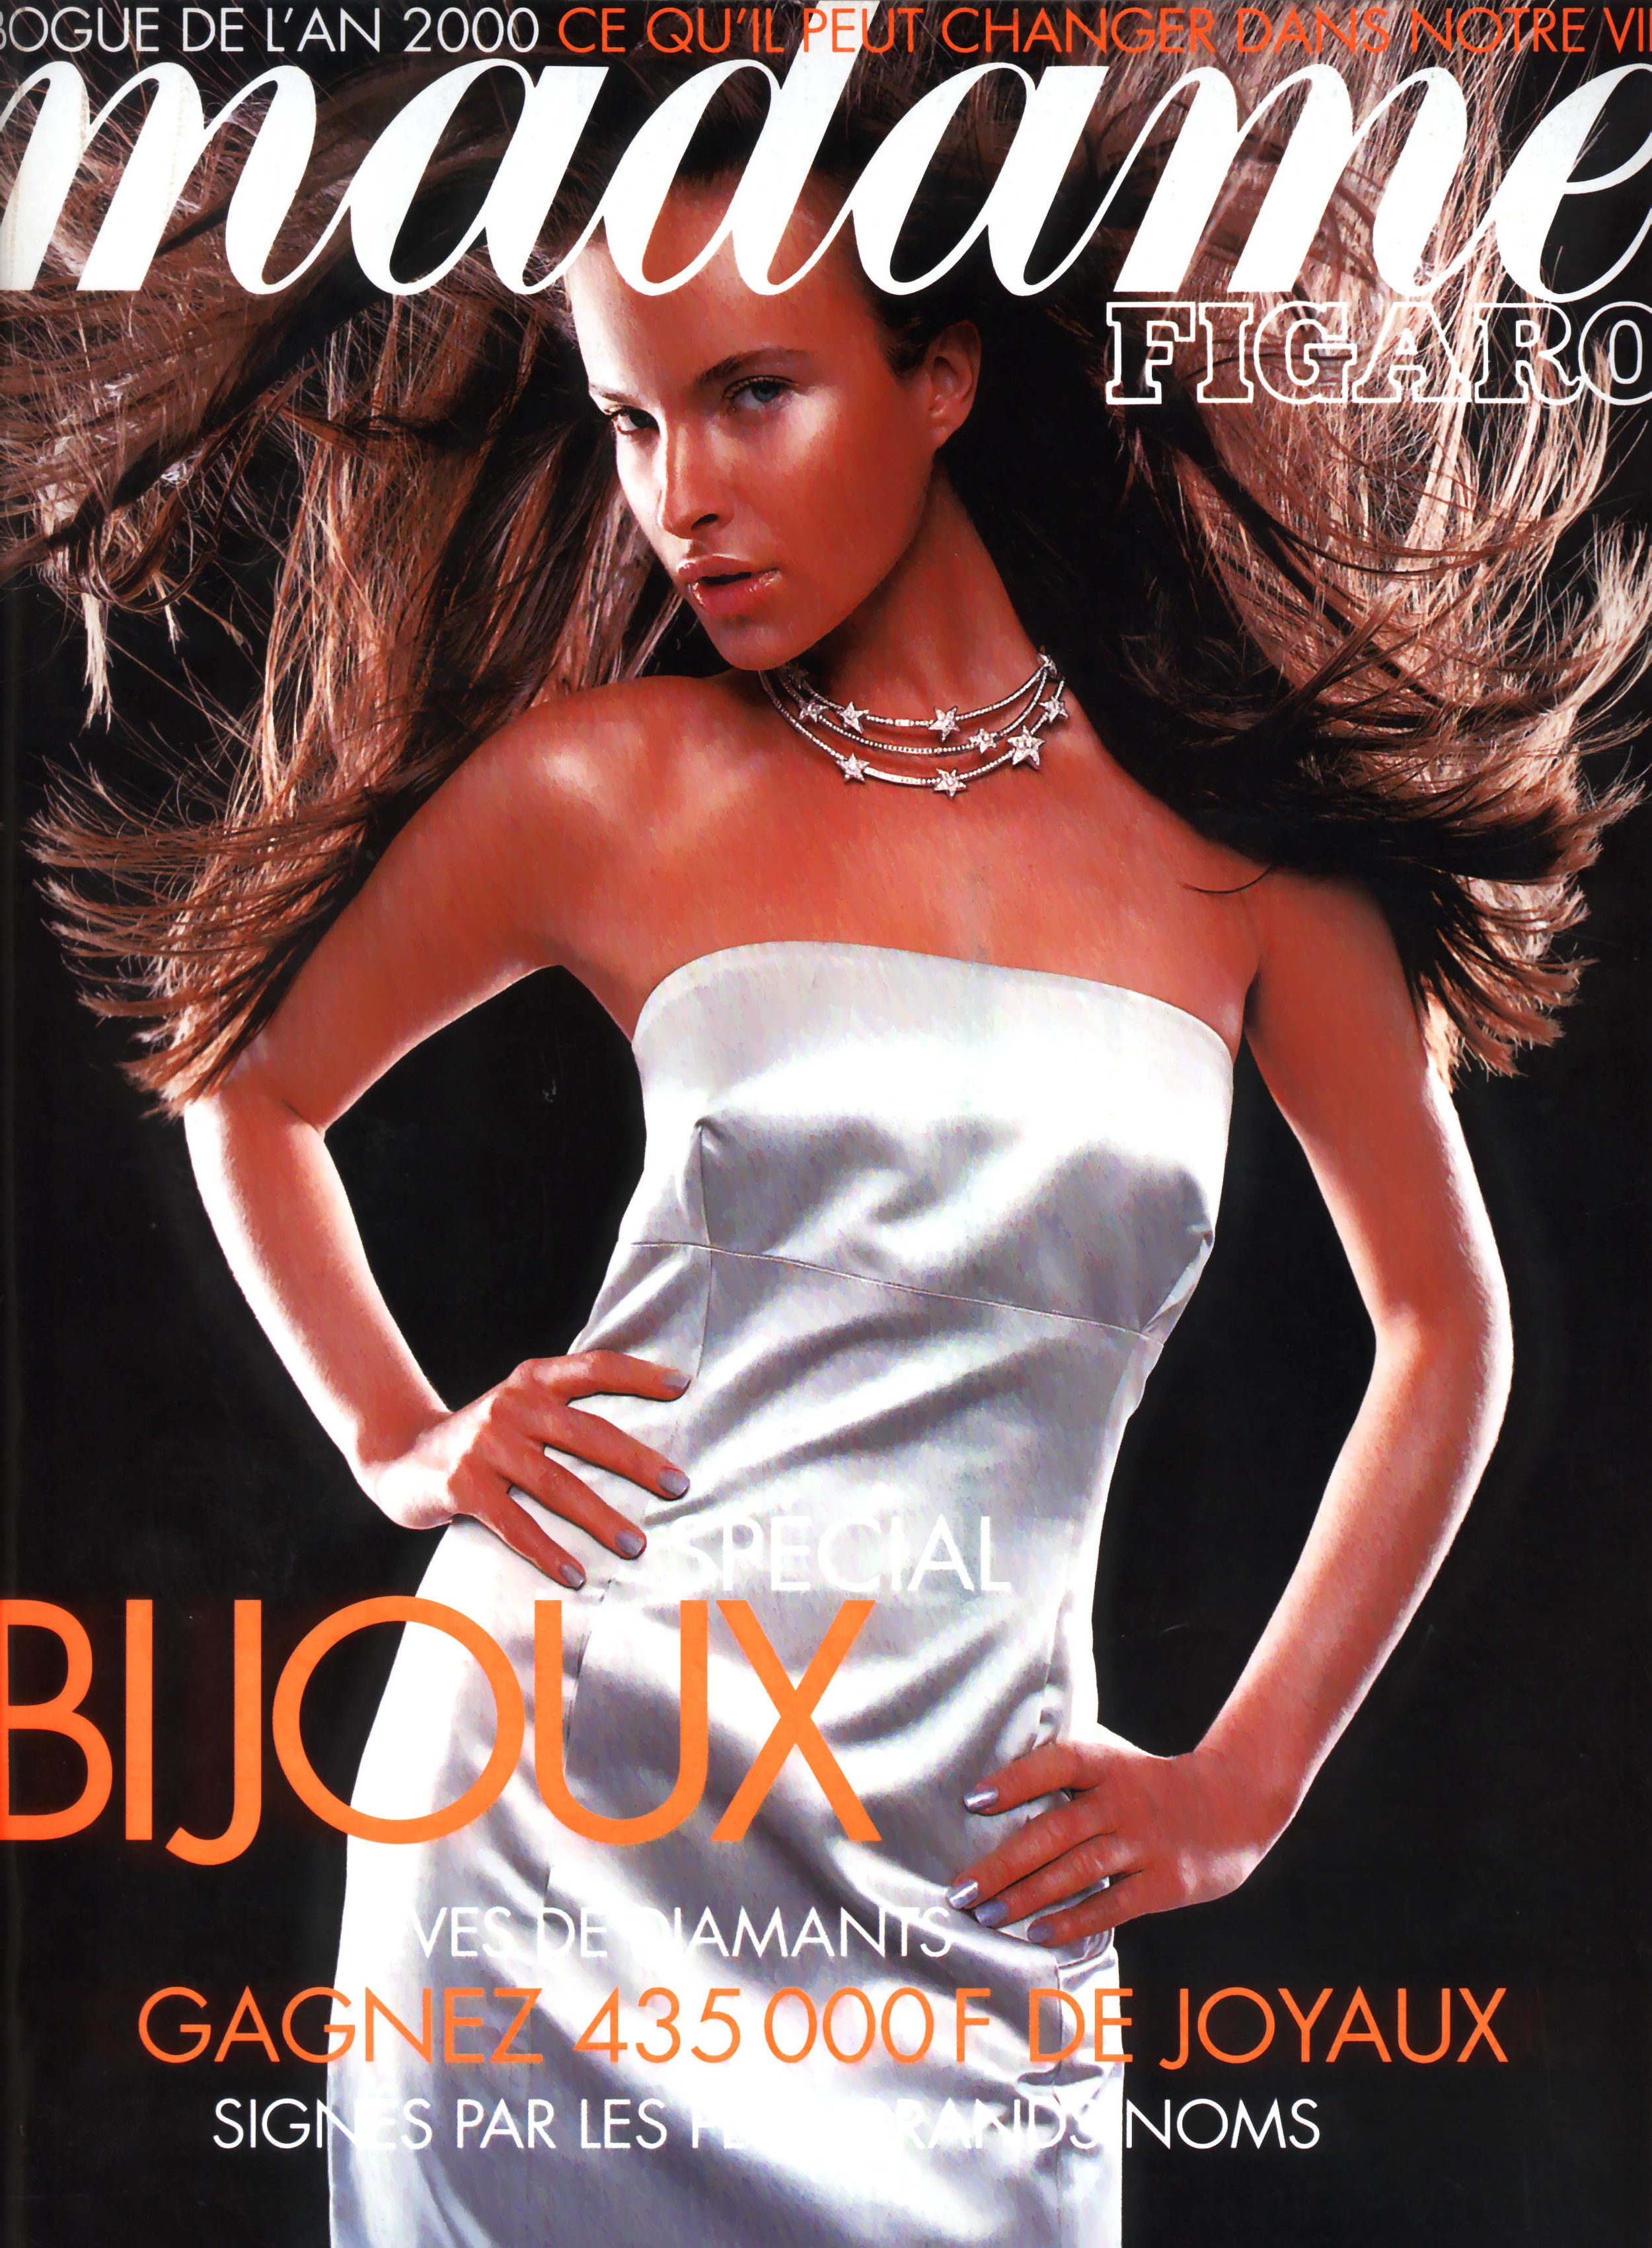 1999 Figaro Dec99 - Couve.jpg